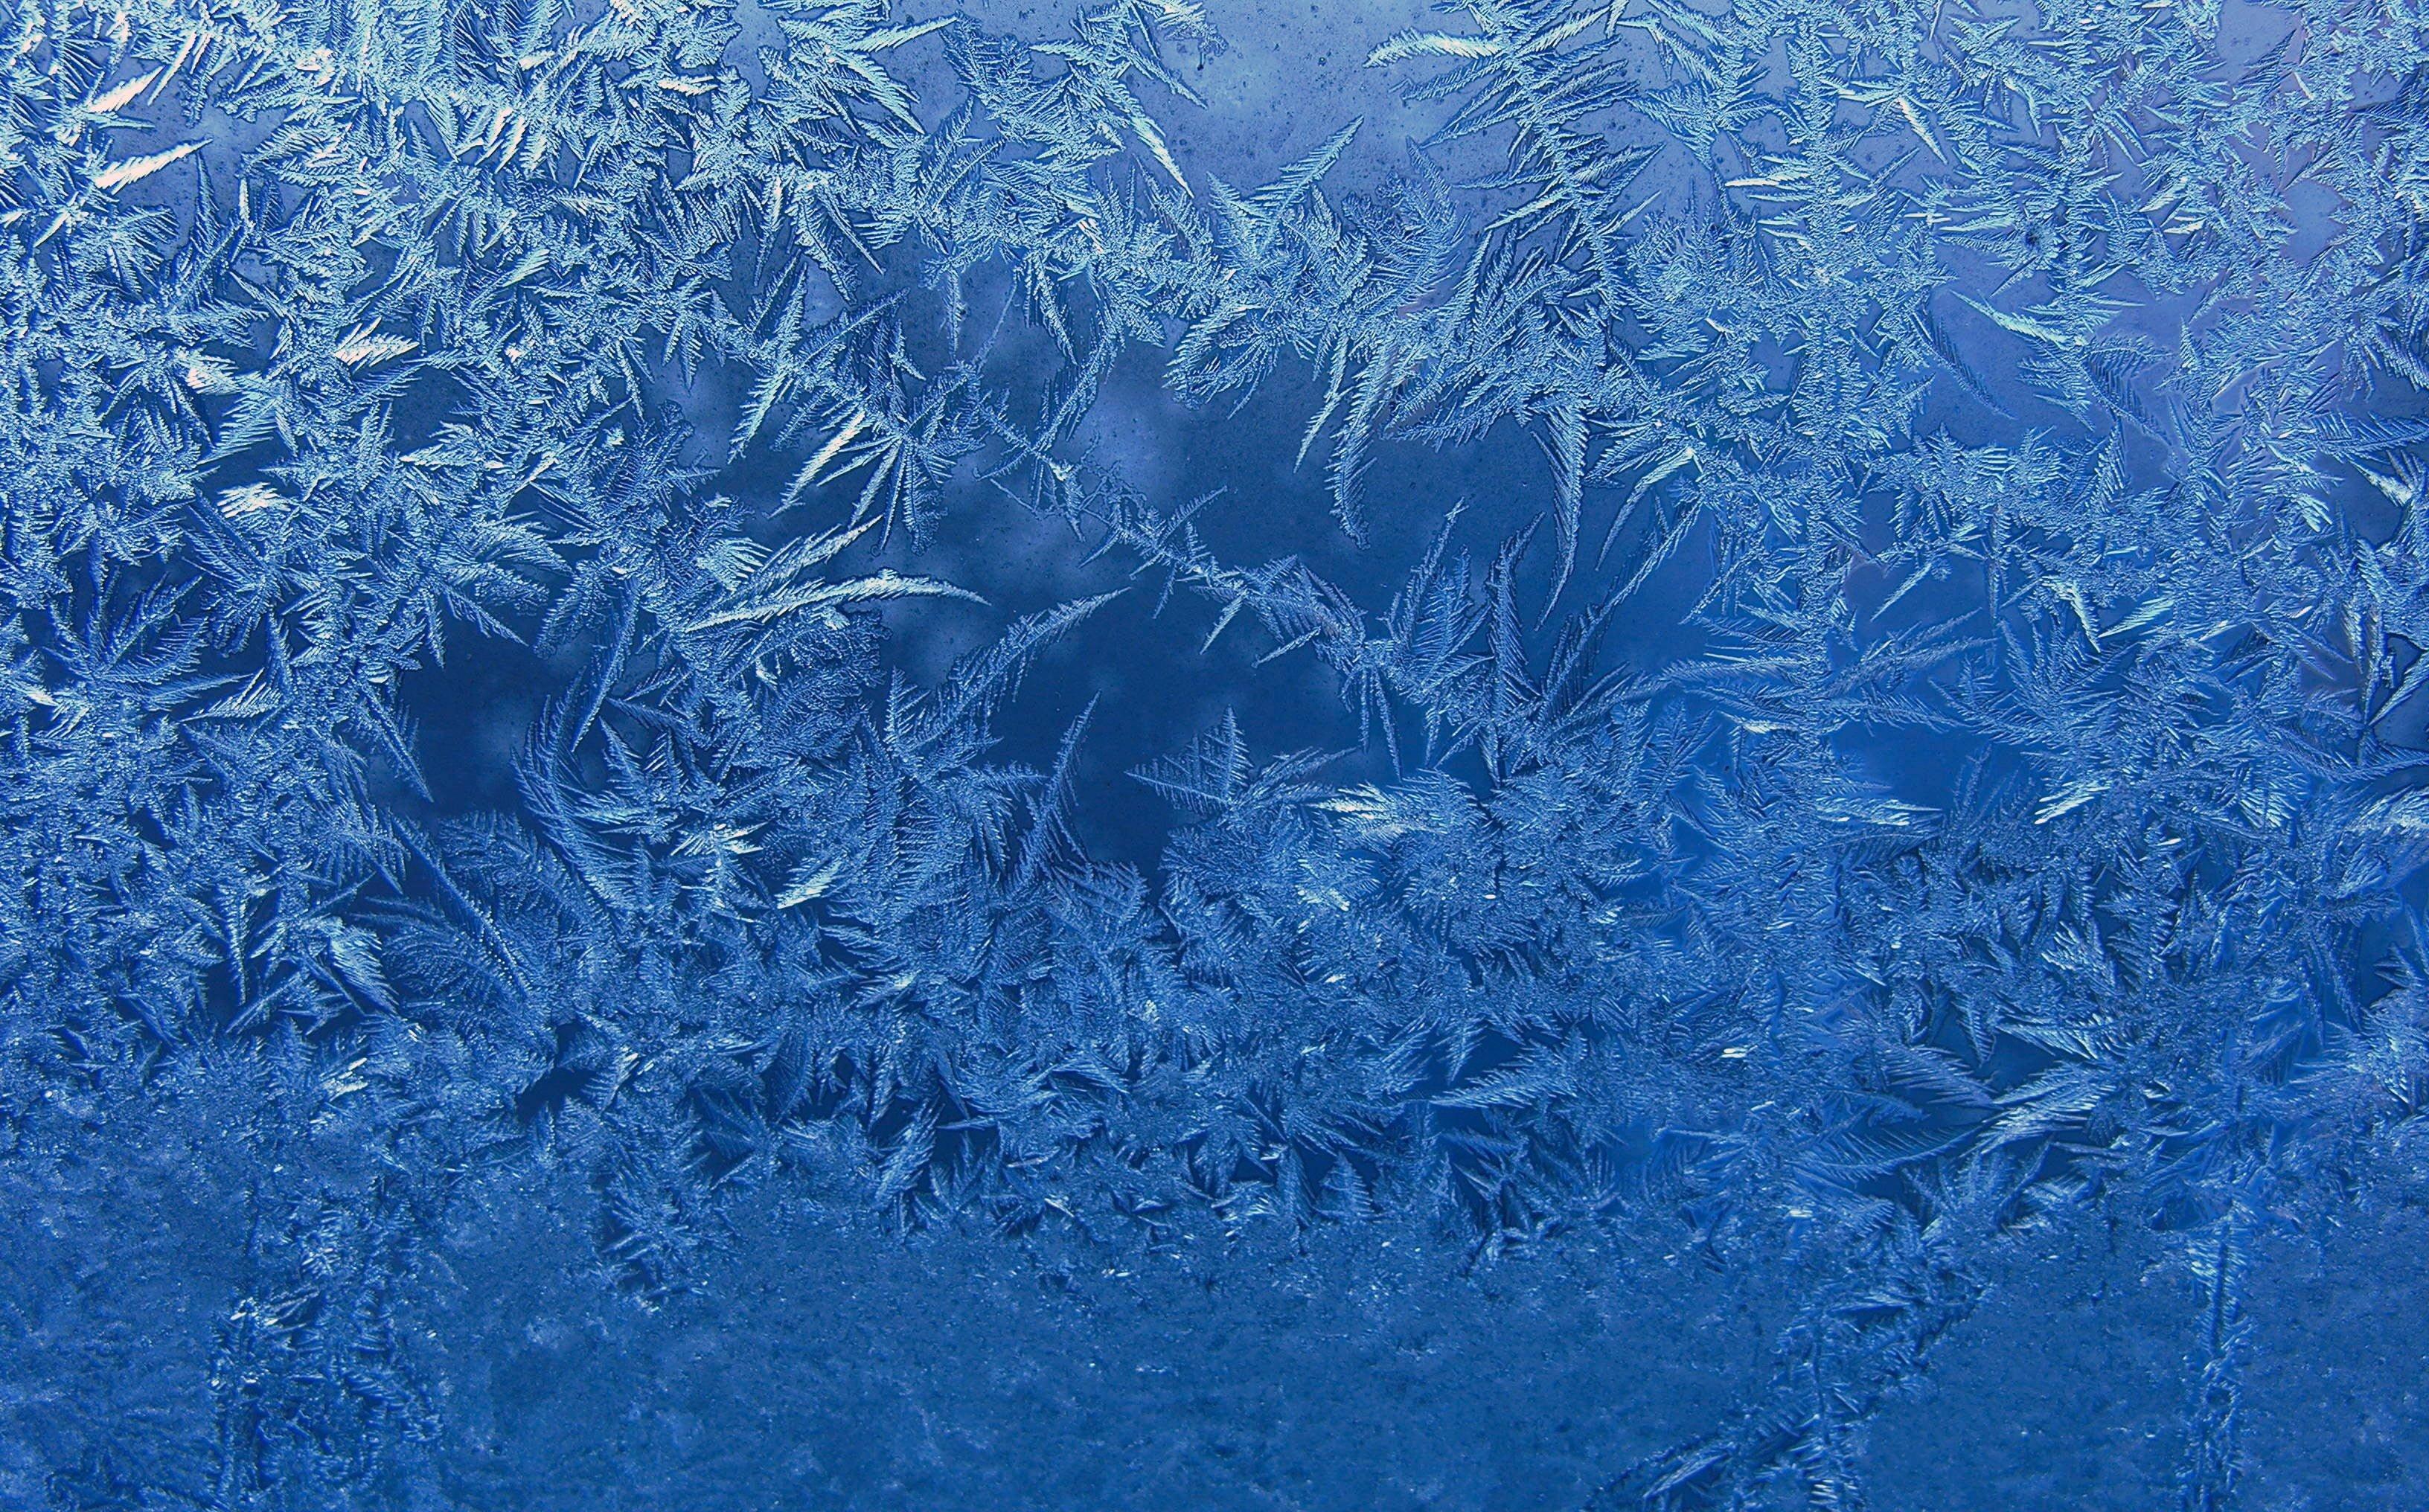 frost blue background glass winter window ice wallpaper background 3264x2032